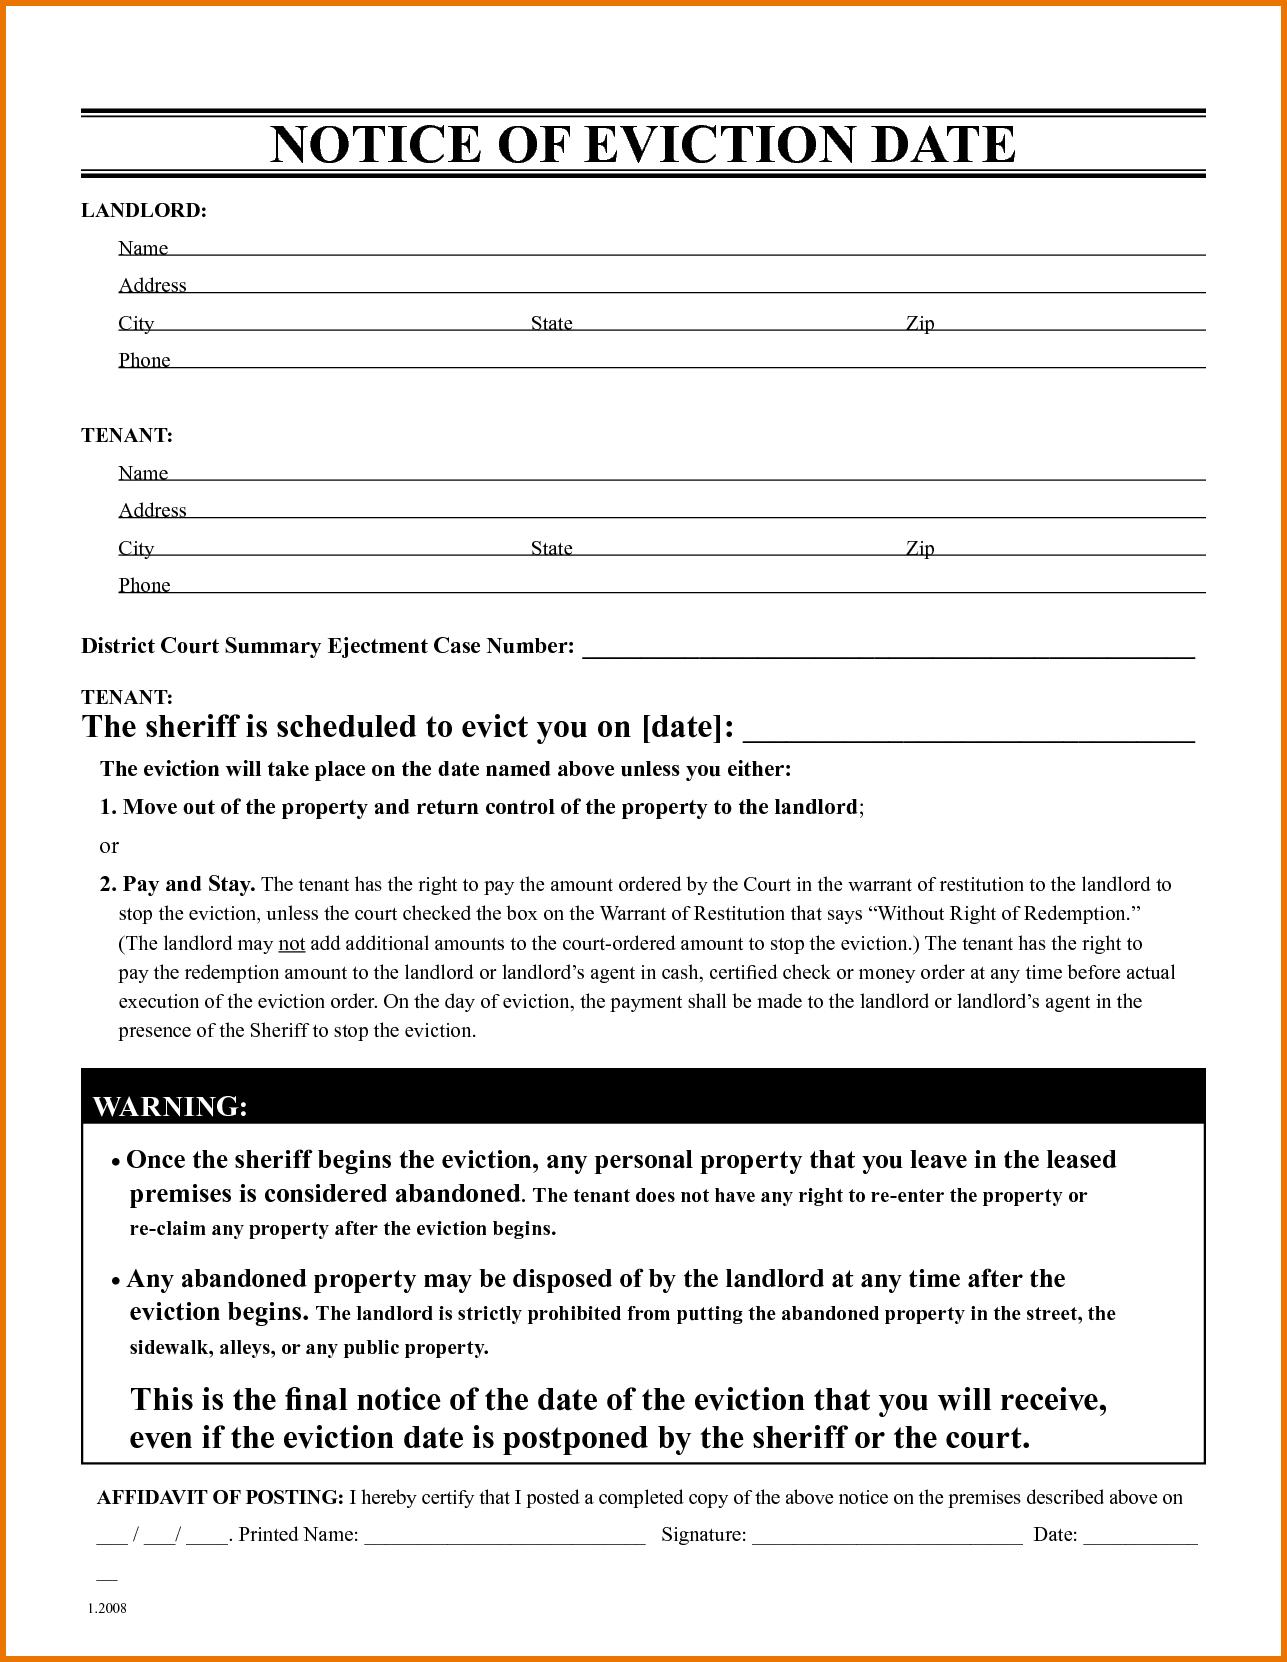 009 Free Eviction Notice Templates Template ~ Ulyssesroom - Free Printable Eviction Notice Ohio